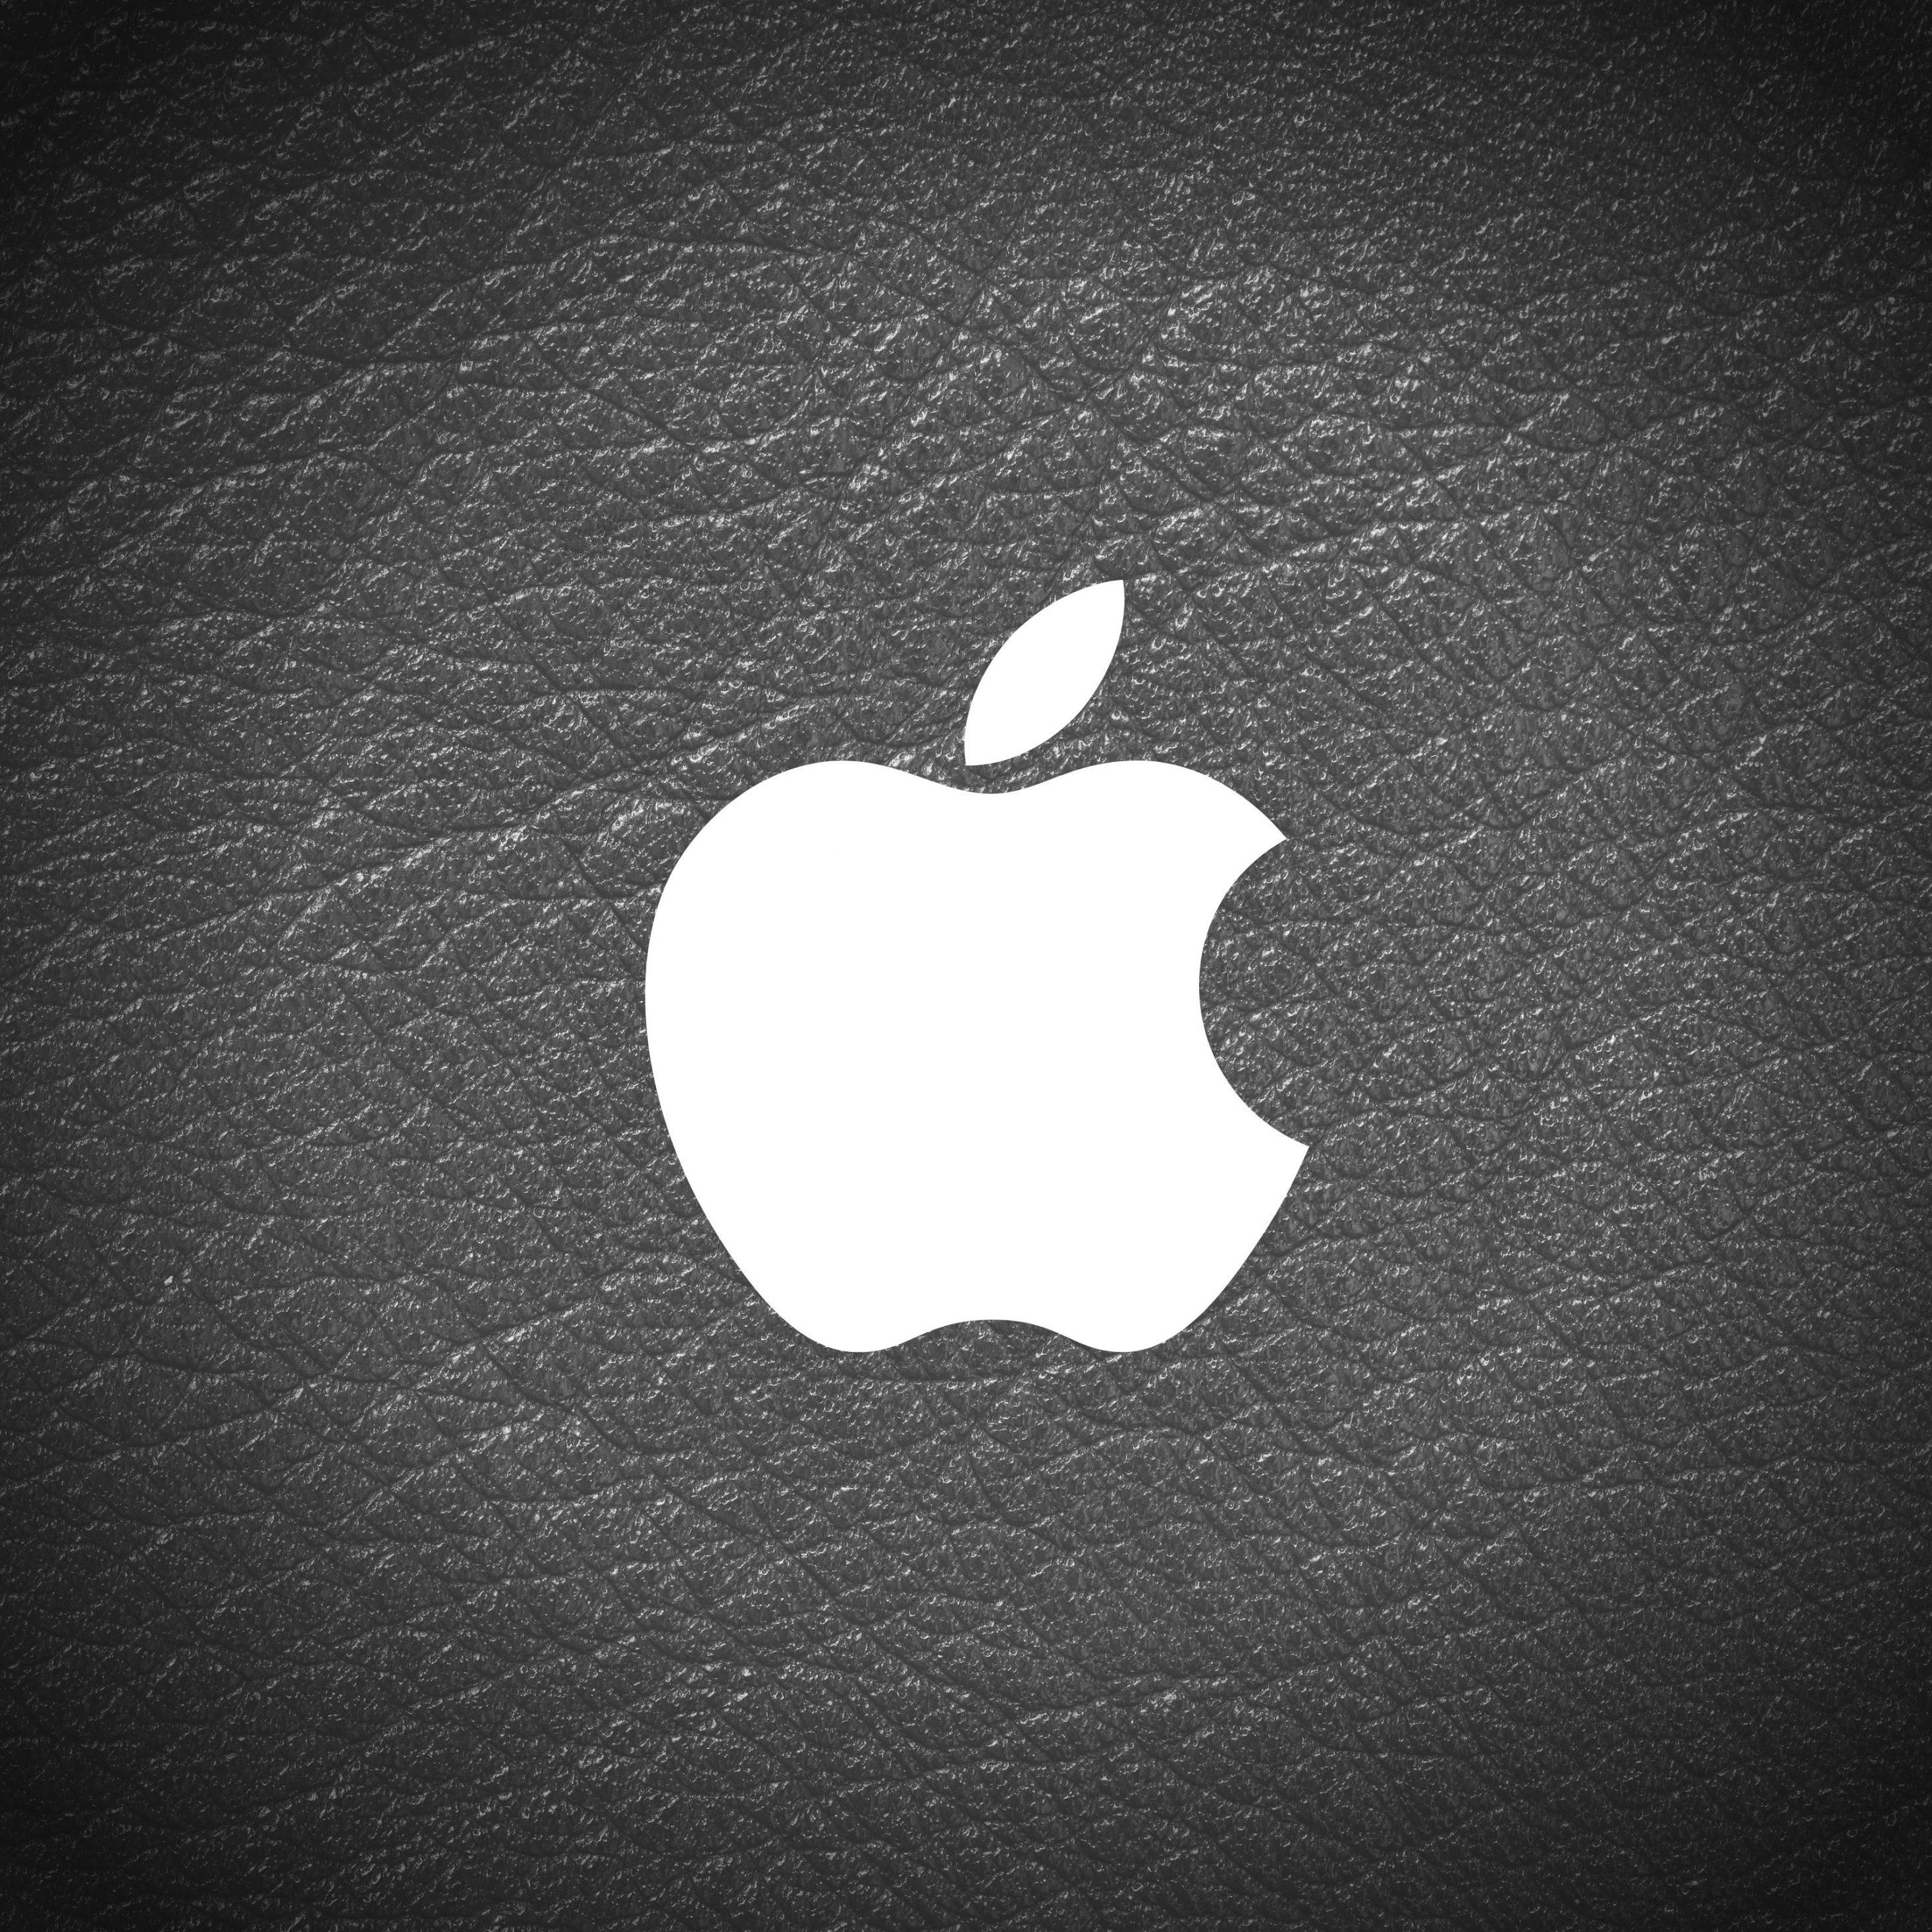 2934x2934 iOS iPad wallpaper 4k Apple Logo Leather Black and White iPad Wallpaper 2934x2934 pixels resolution